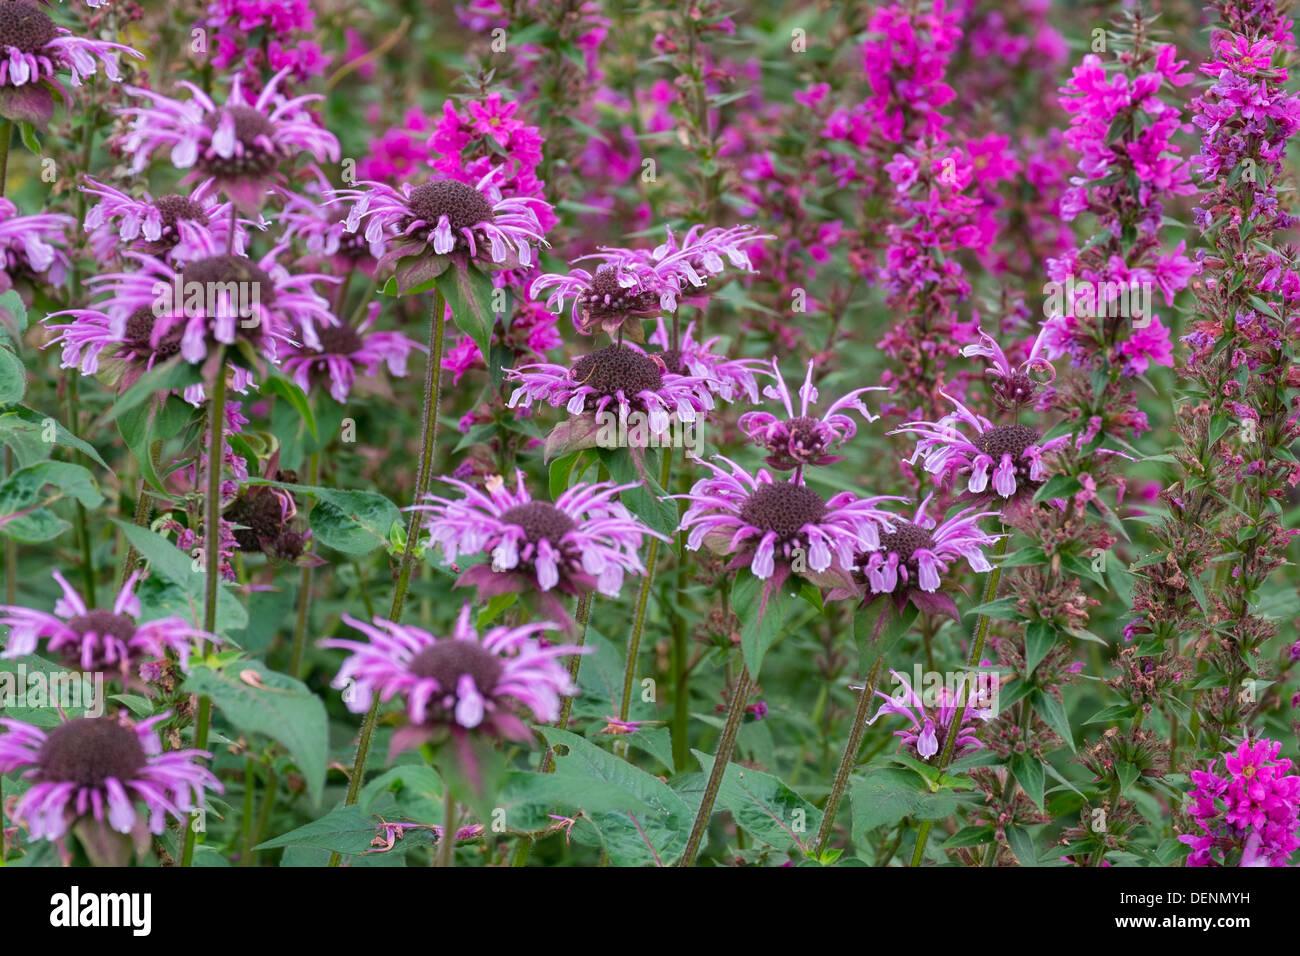 Monarda, Bergamot, Bee Balm, and Lythrum salicaria, Purple loosestrife in a cottage garden. - Stock Image